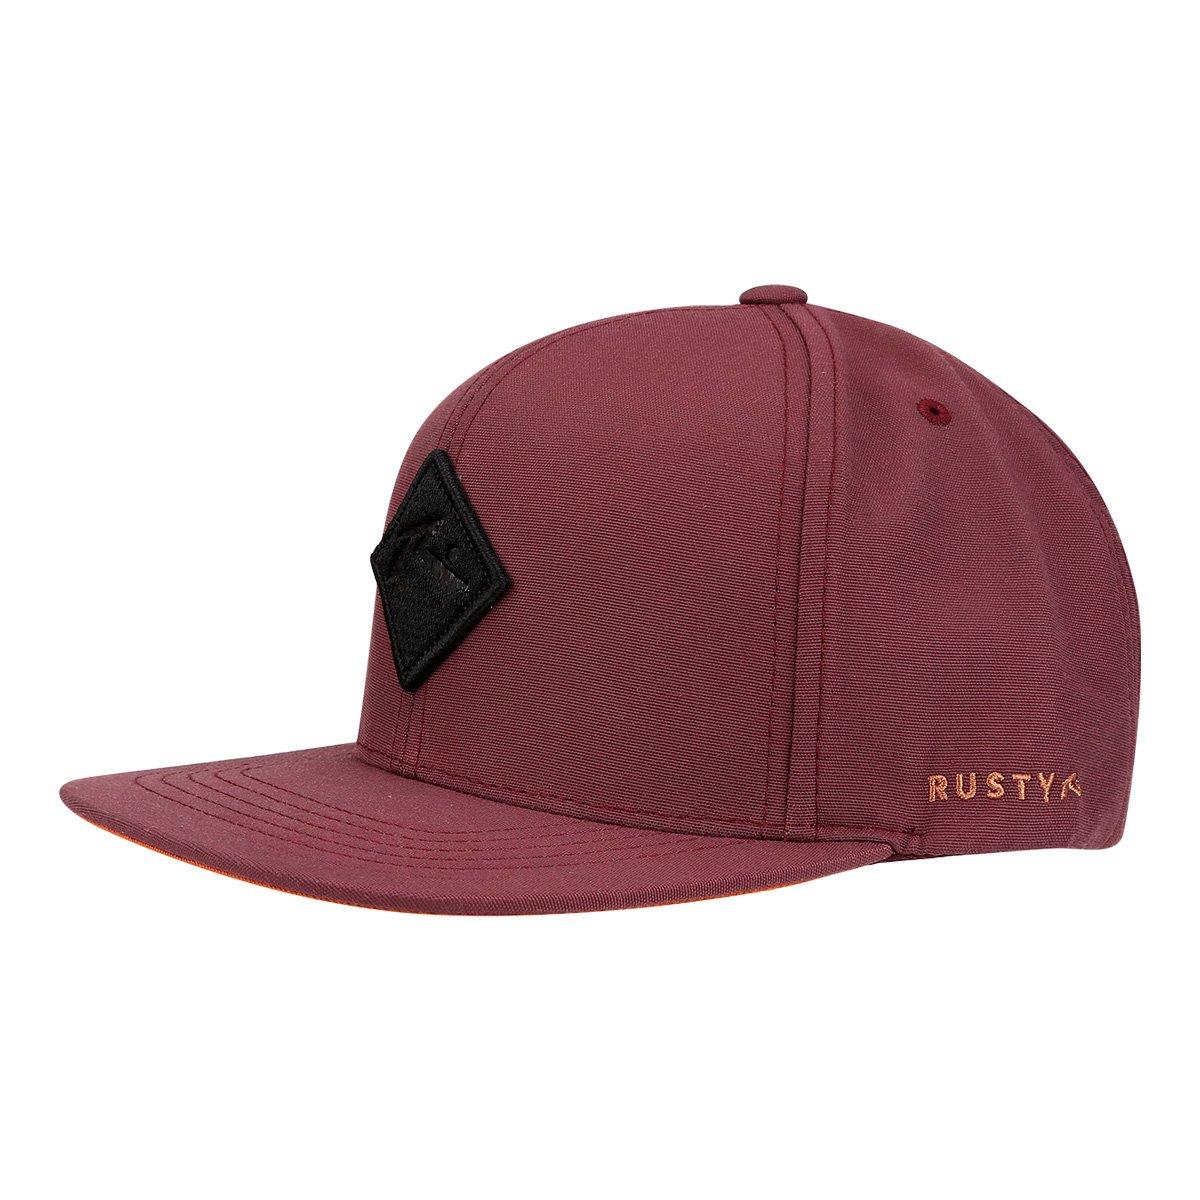 52094c4bb Boné Rusty Aba Reta Tender Lead Masculino - Compre Agora | Netshoes